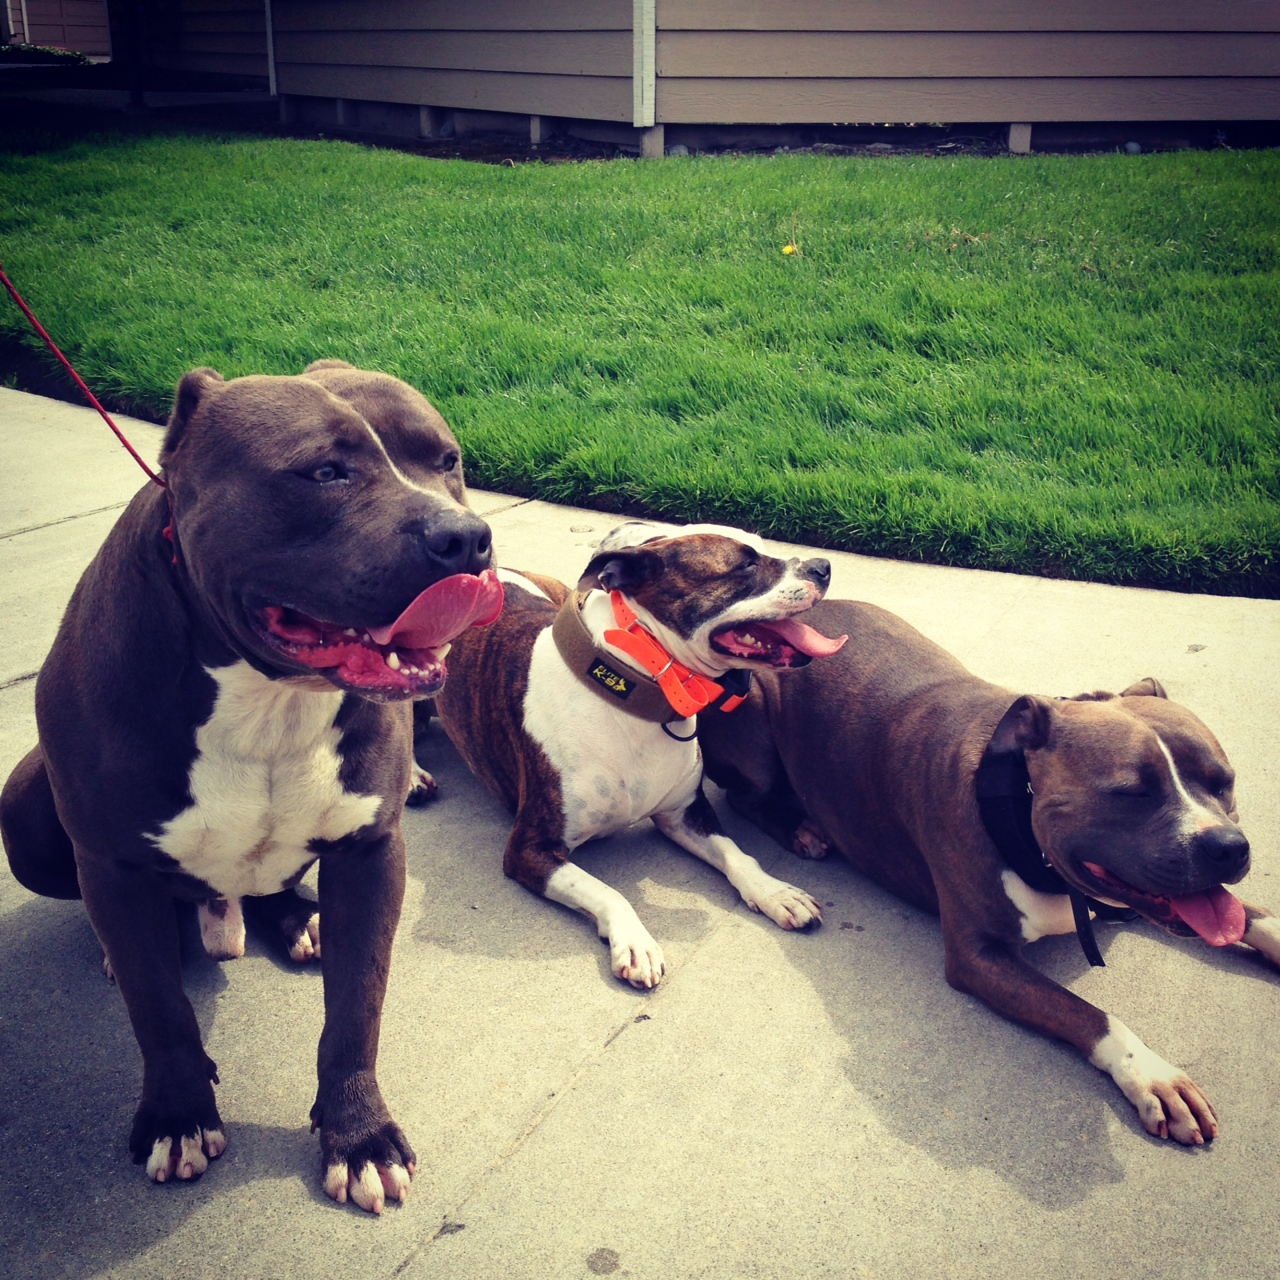 socialization dog training primal canine